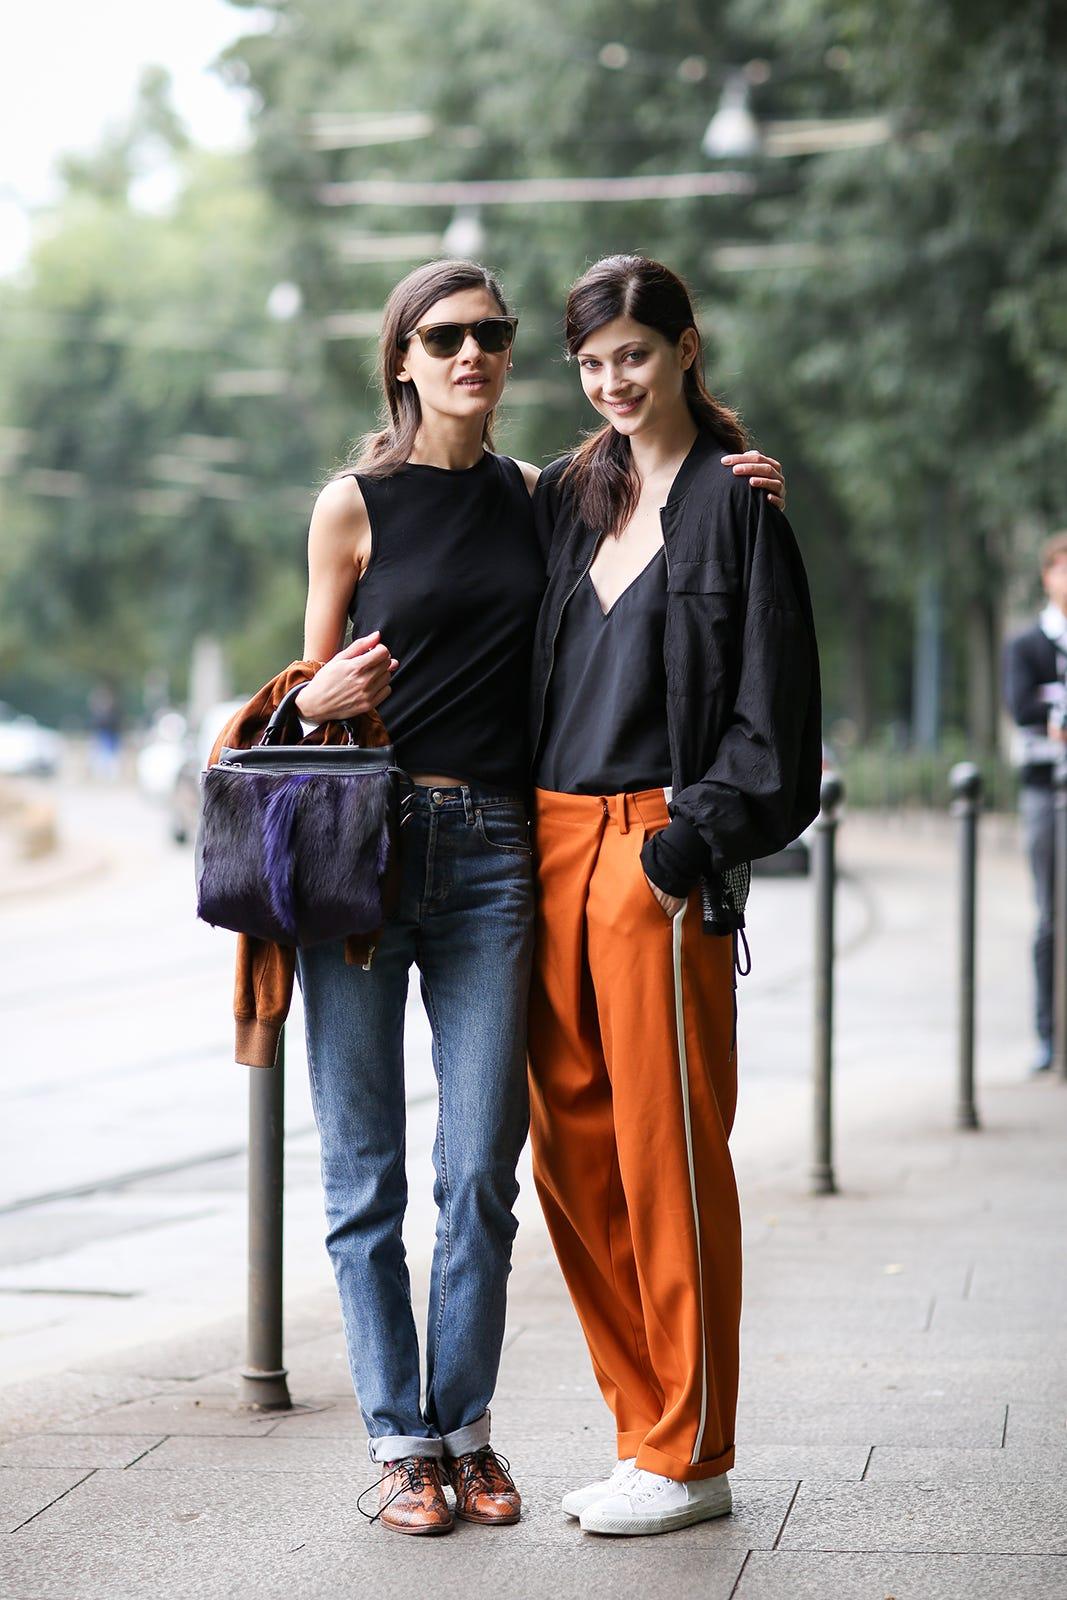 Milan Street Style - Italian Fashion | 1067 x 1600 jpeg 207kB